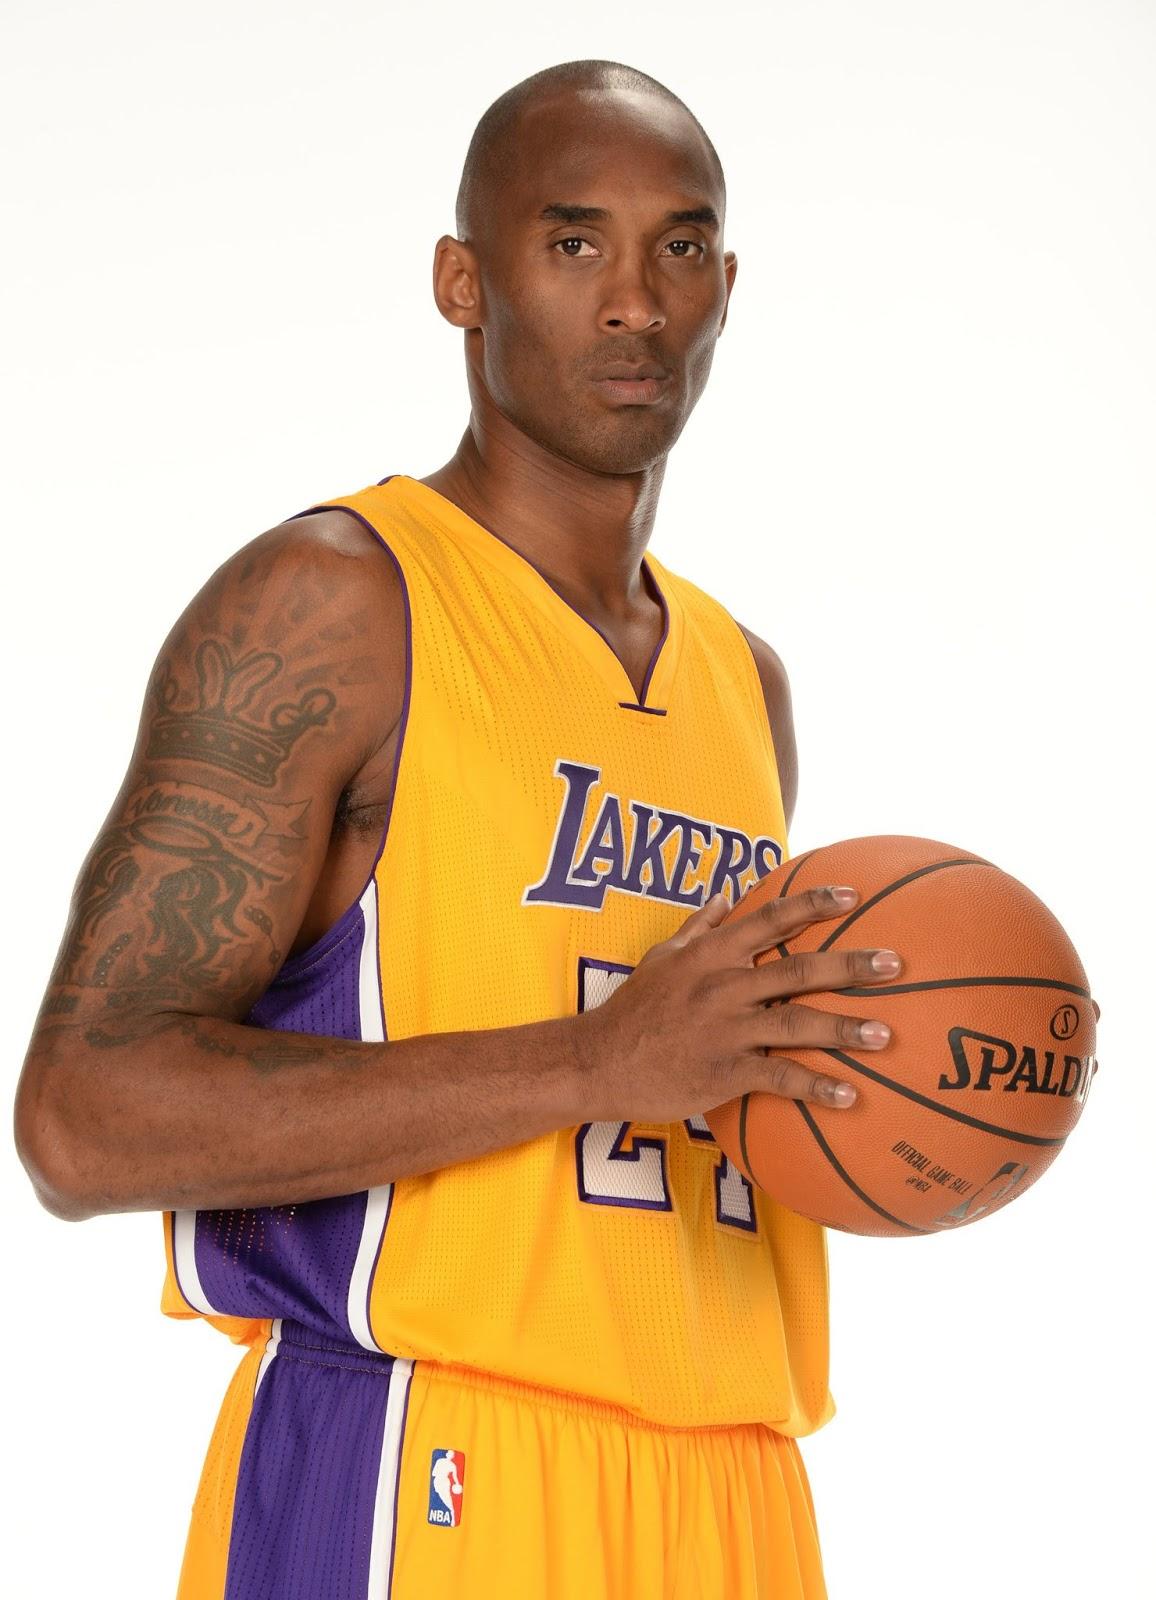 Biografi Kobe Bryant Atlet Bola Basket Dengan Segudang Prestasi